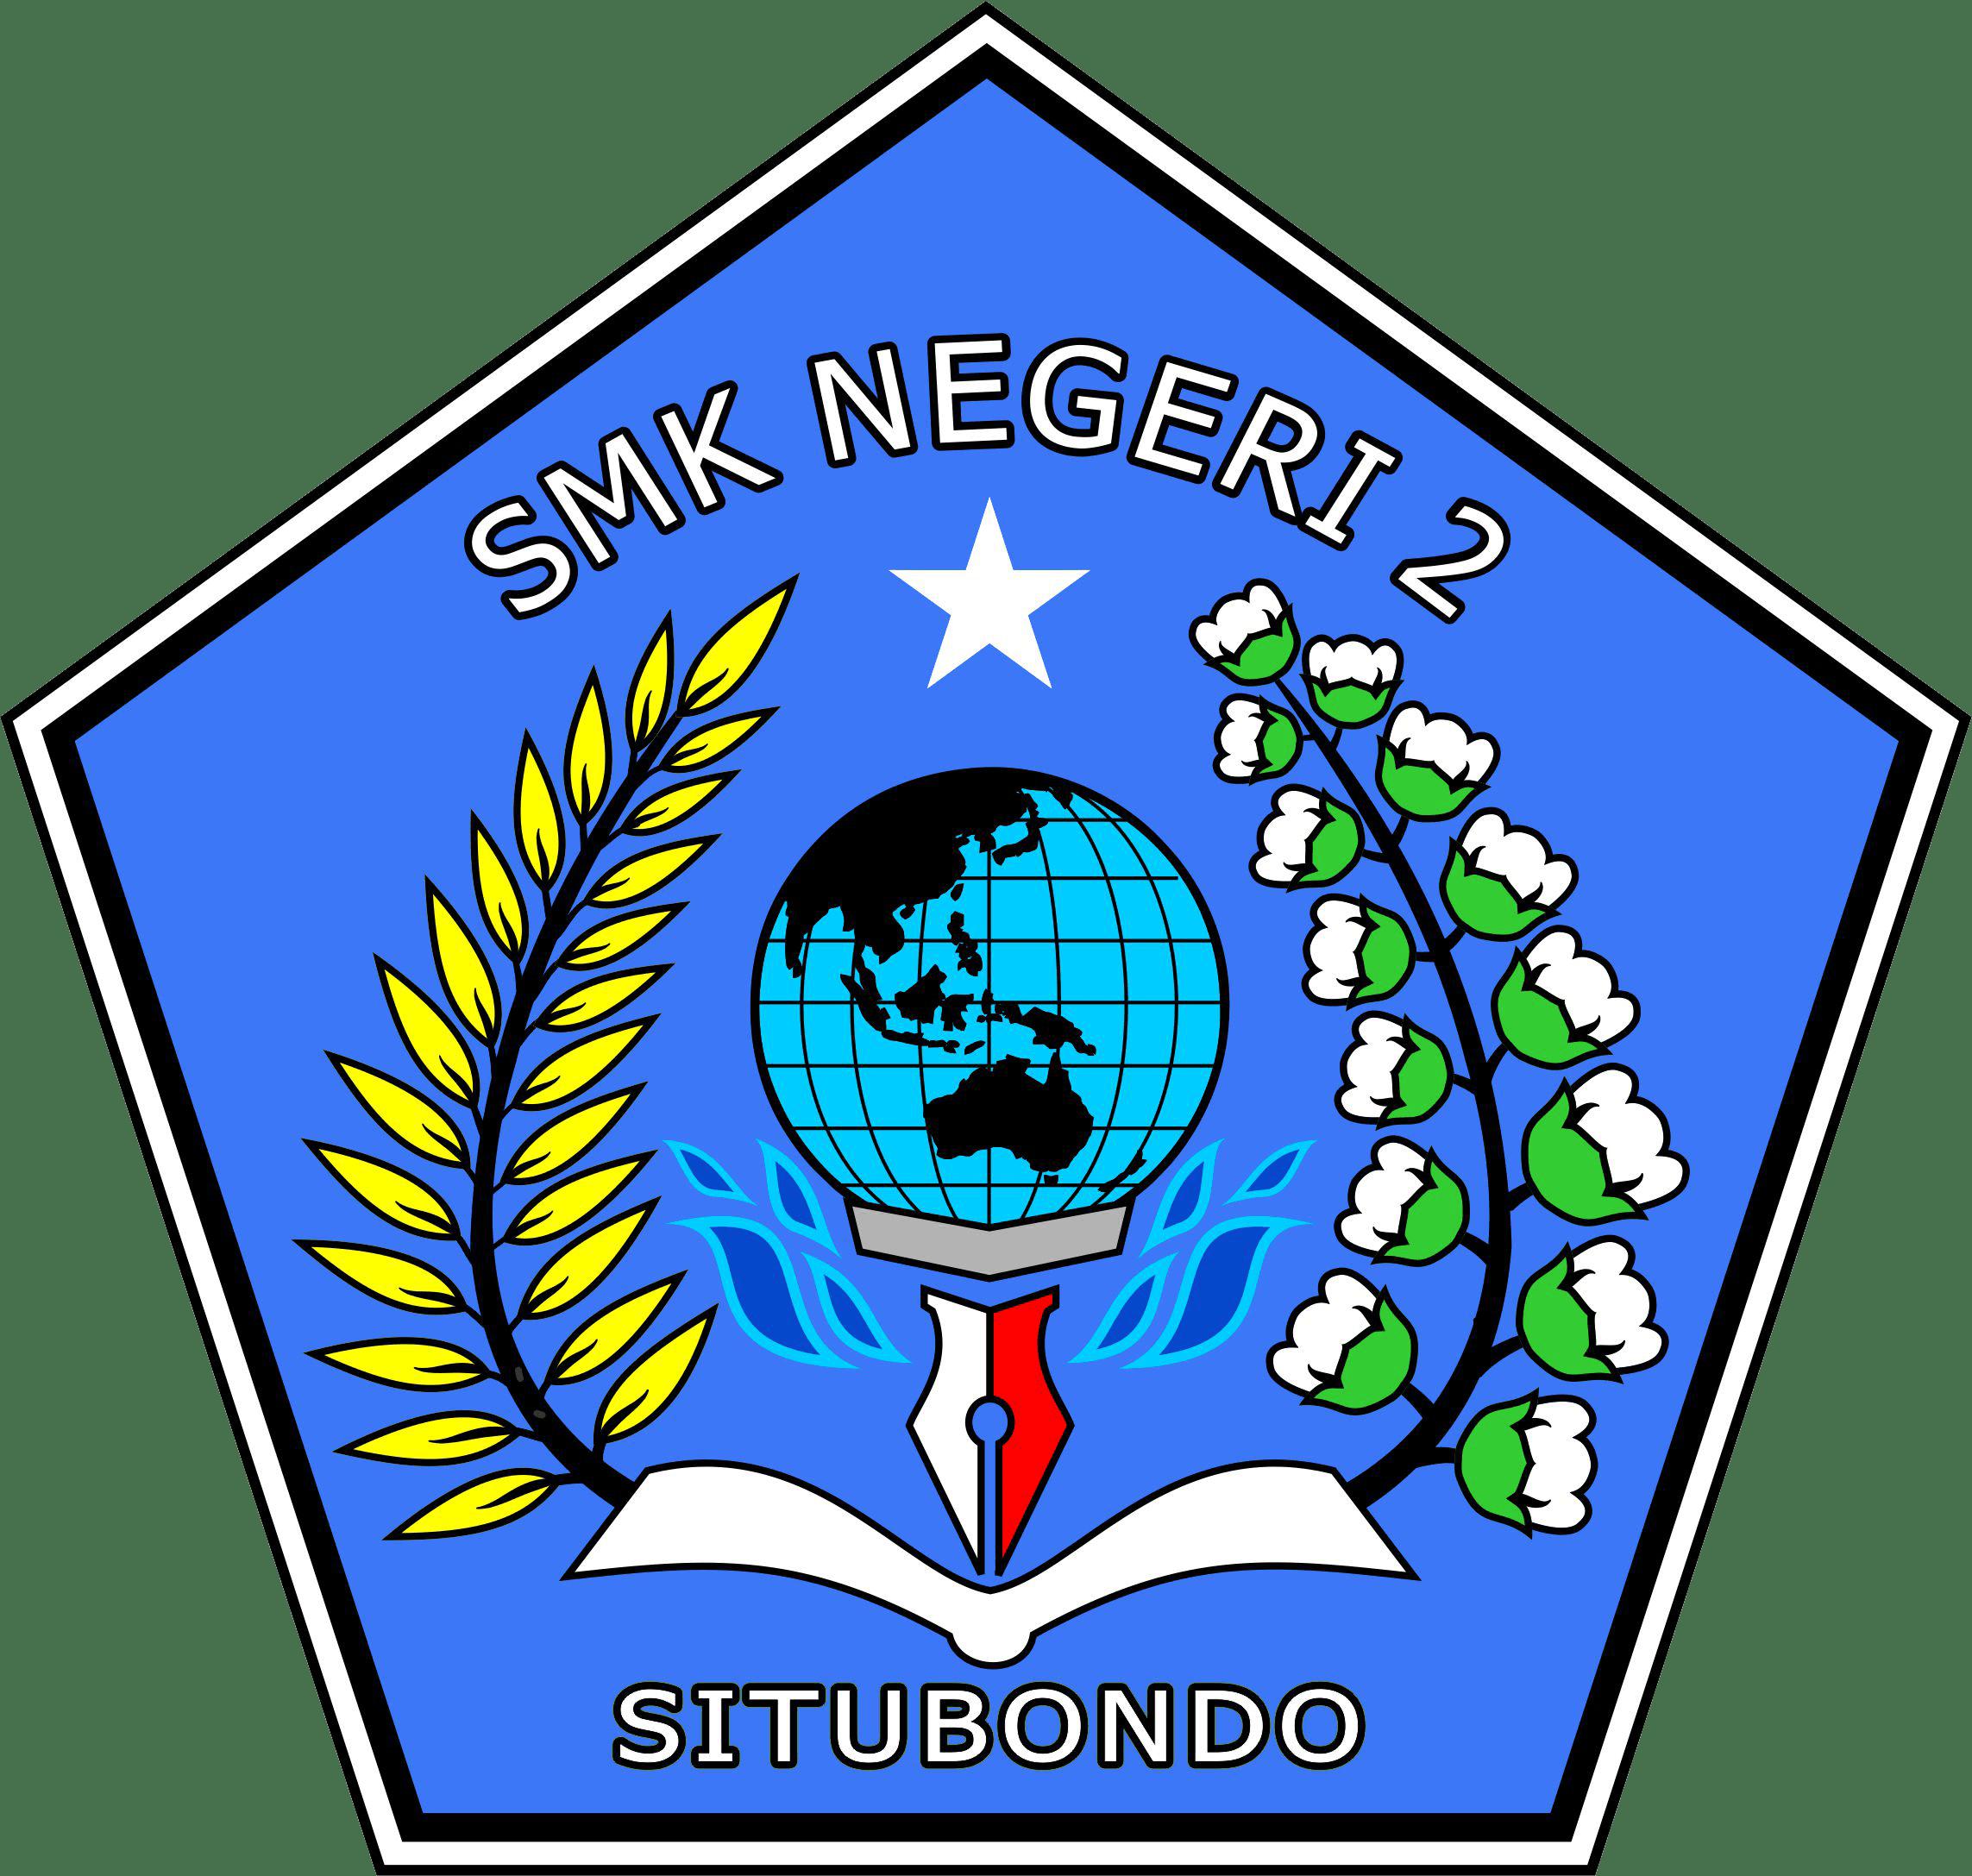 SMKN 2 Situbondo